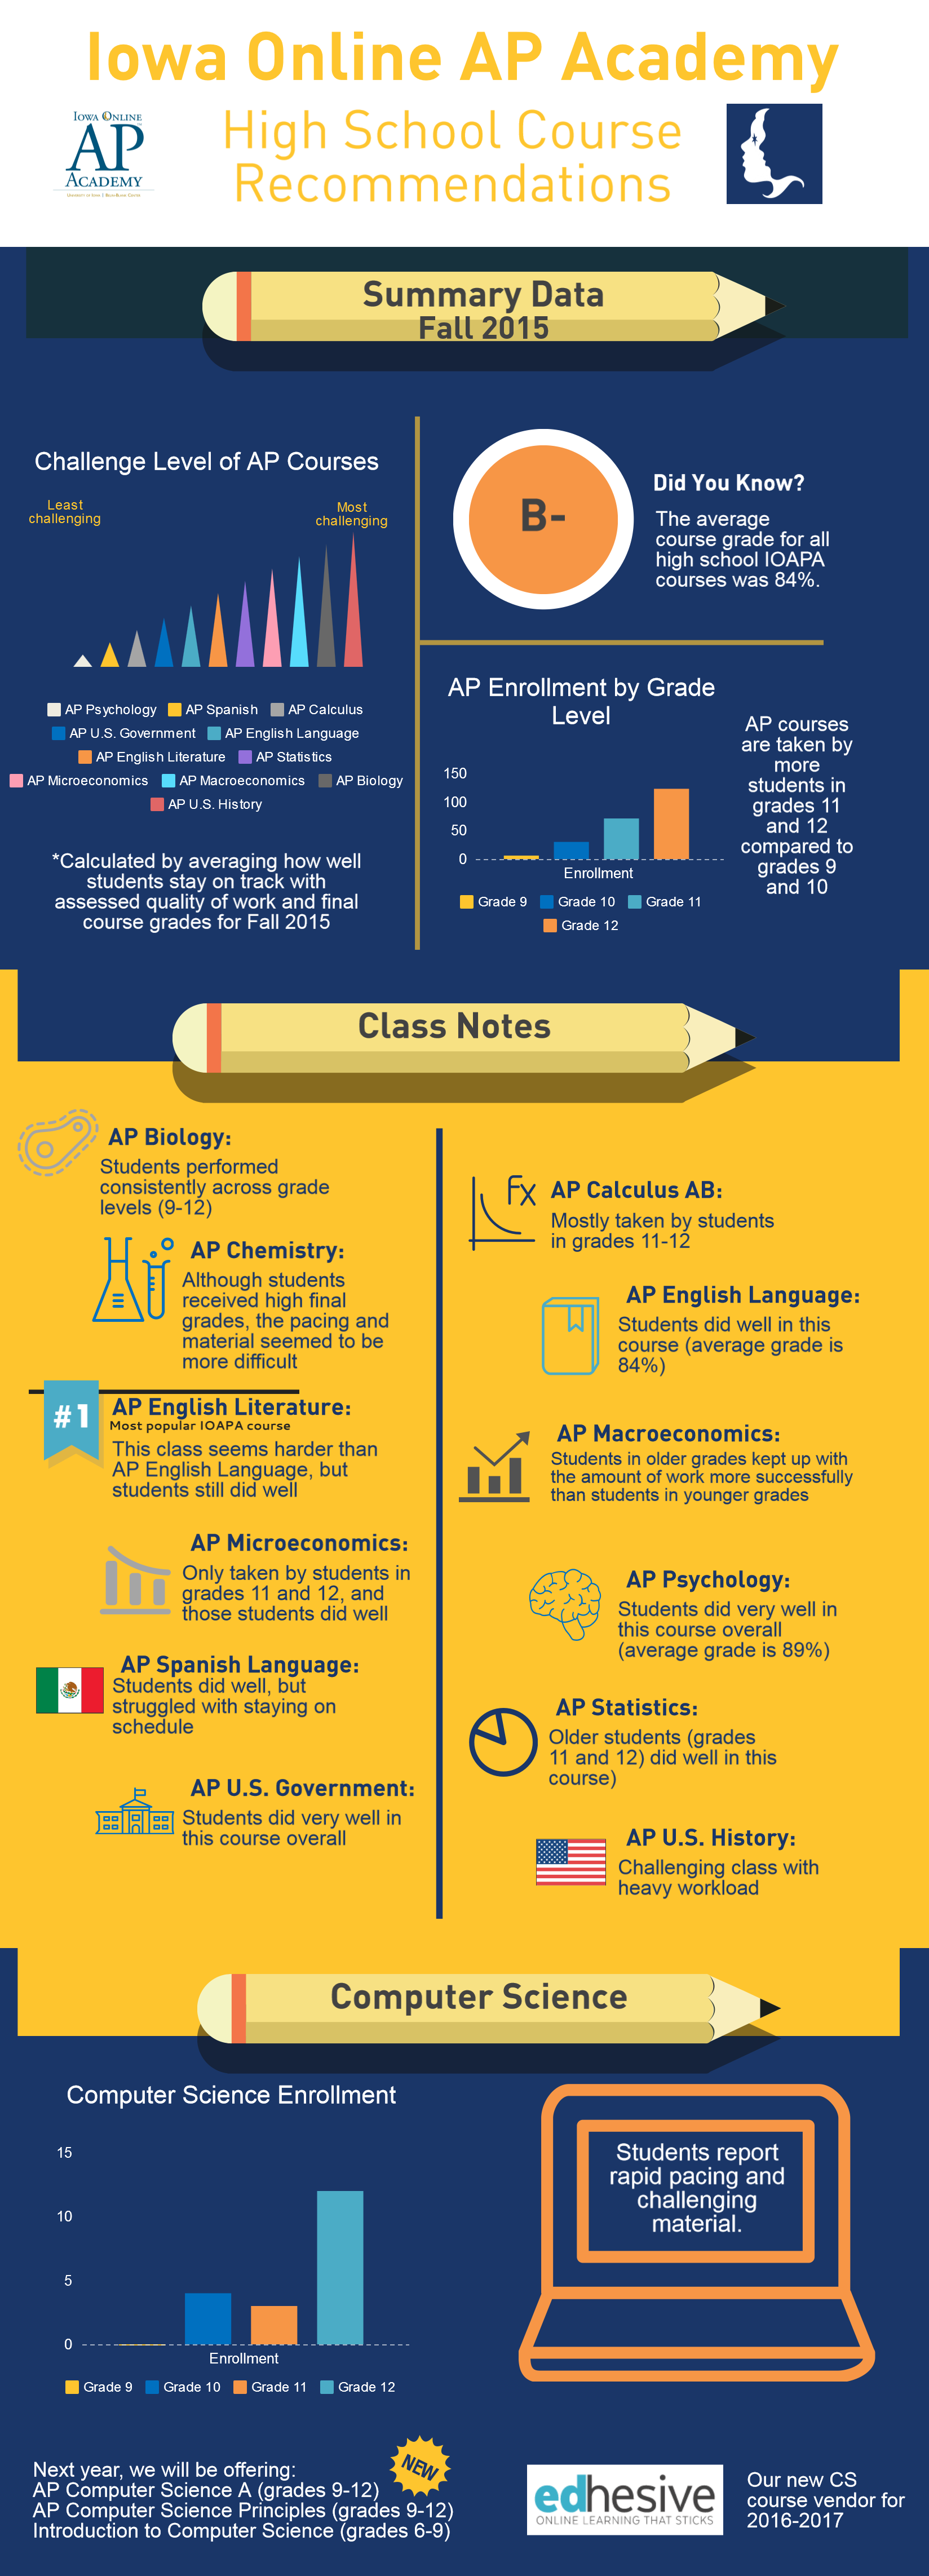 IOAPA Fall 2015 HS Data Infographic